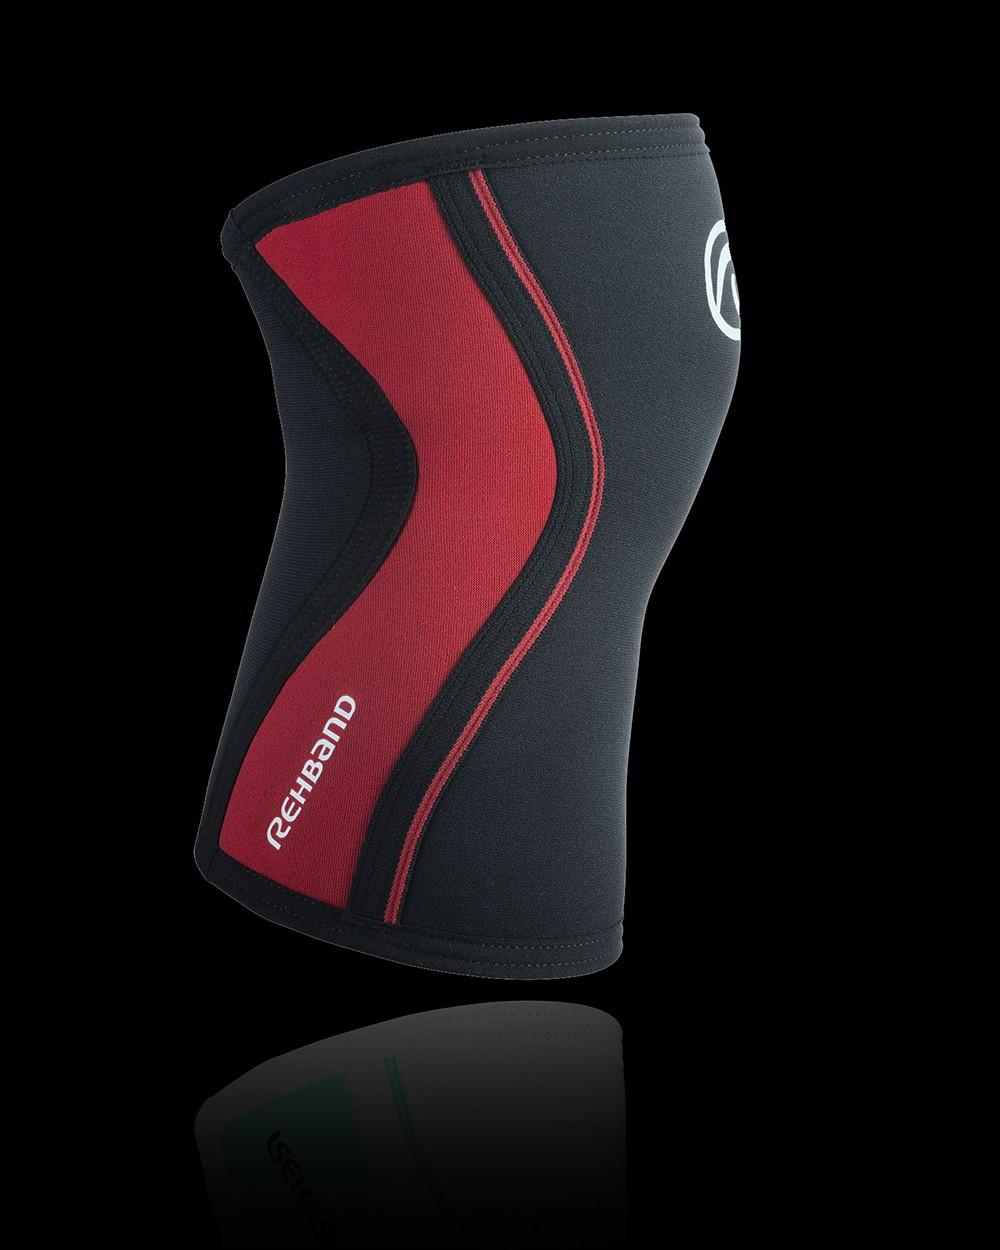 Rehband RX Kniebandage schwarz/rot 3mm